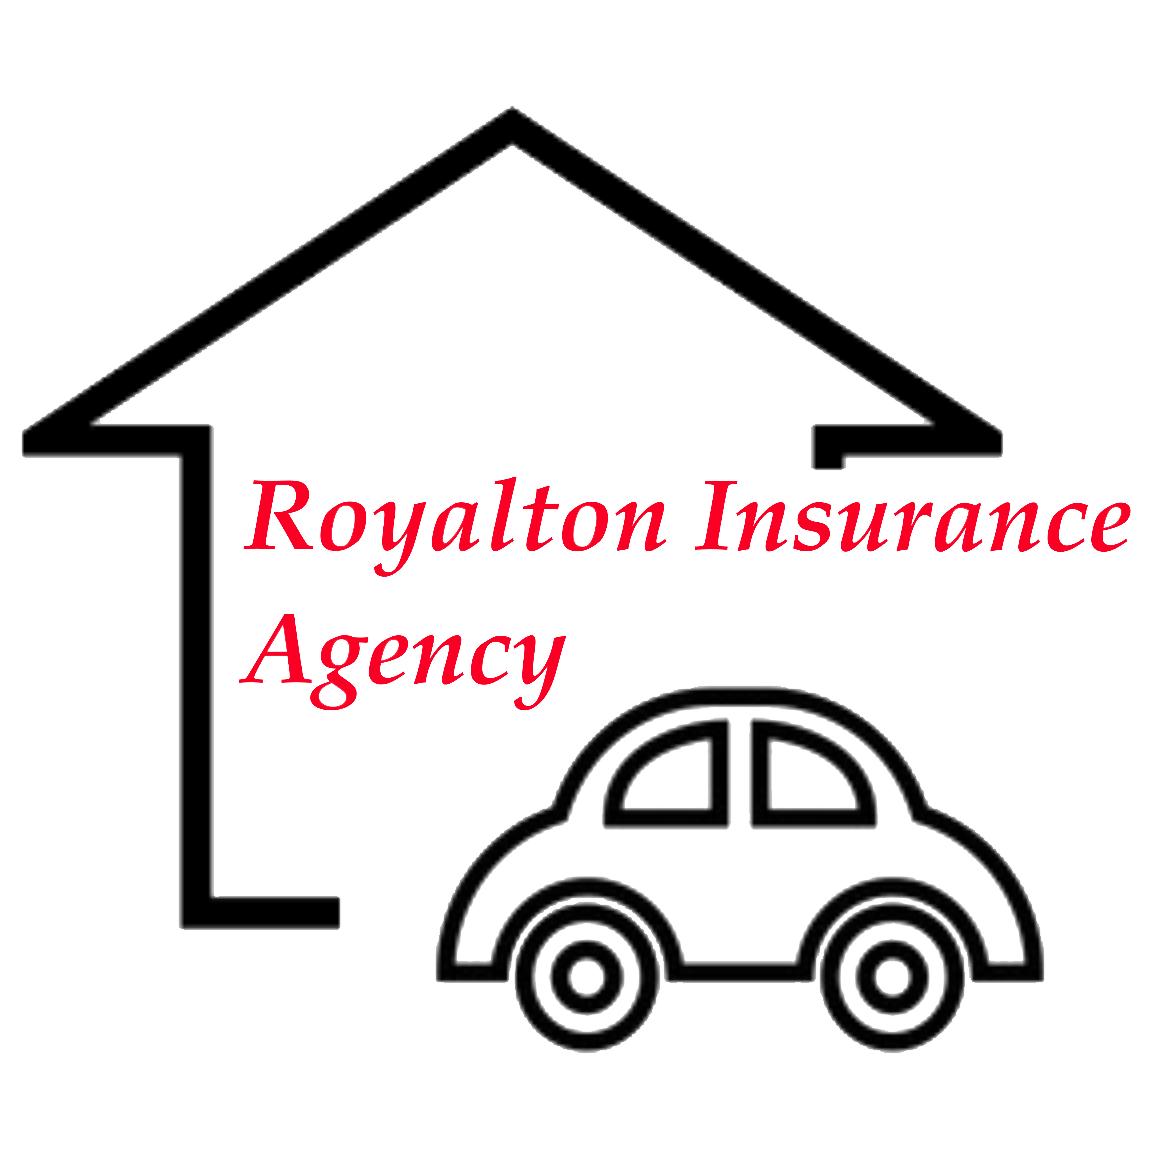 Royalton Insurance Agency